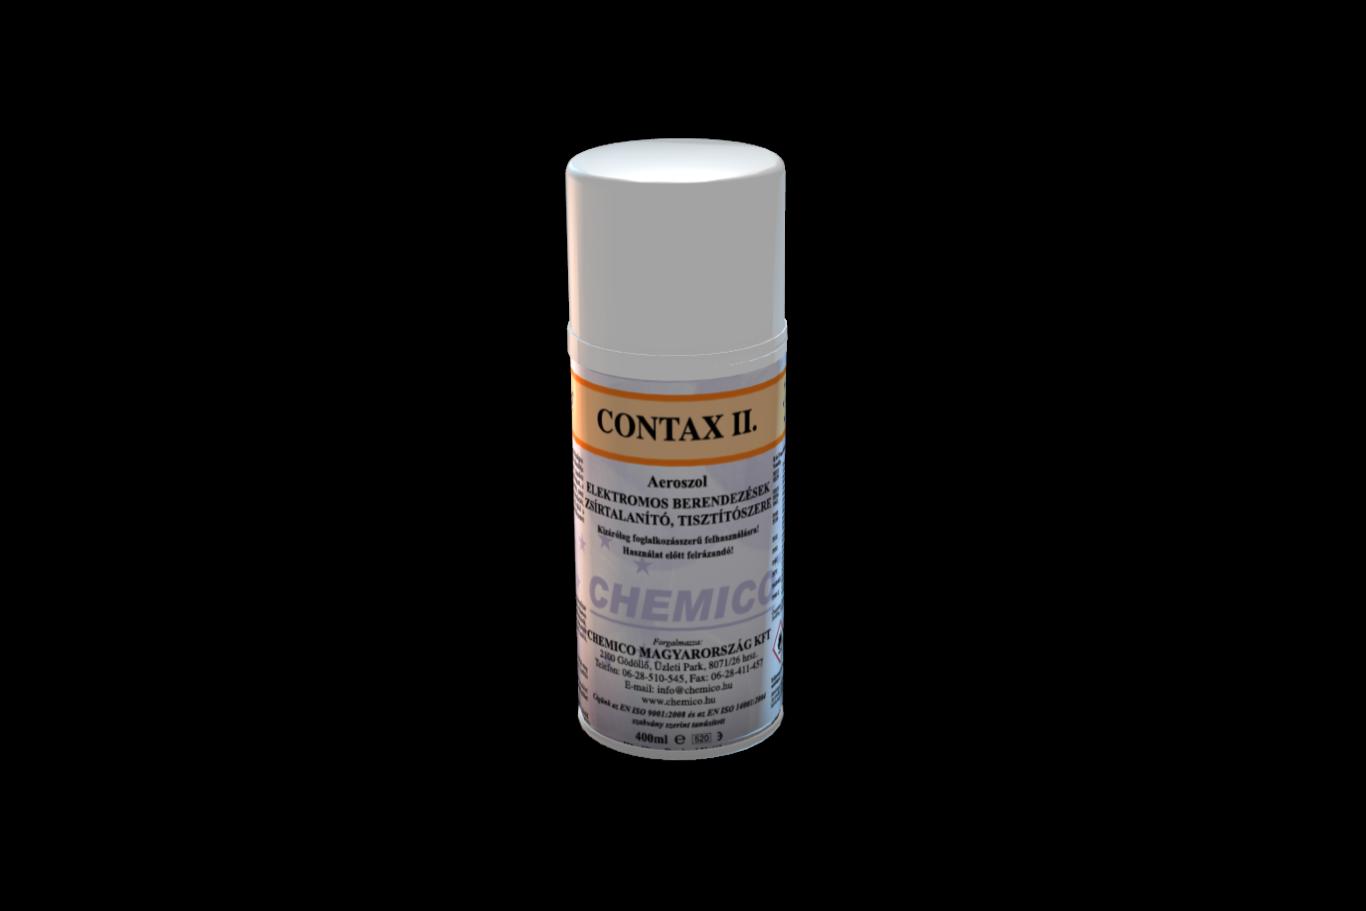 contax-ii-aerosol-spray-zsiroldo-zsirtalanito-ipari-chemico